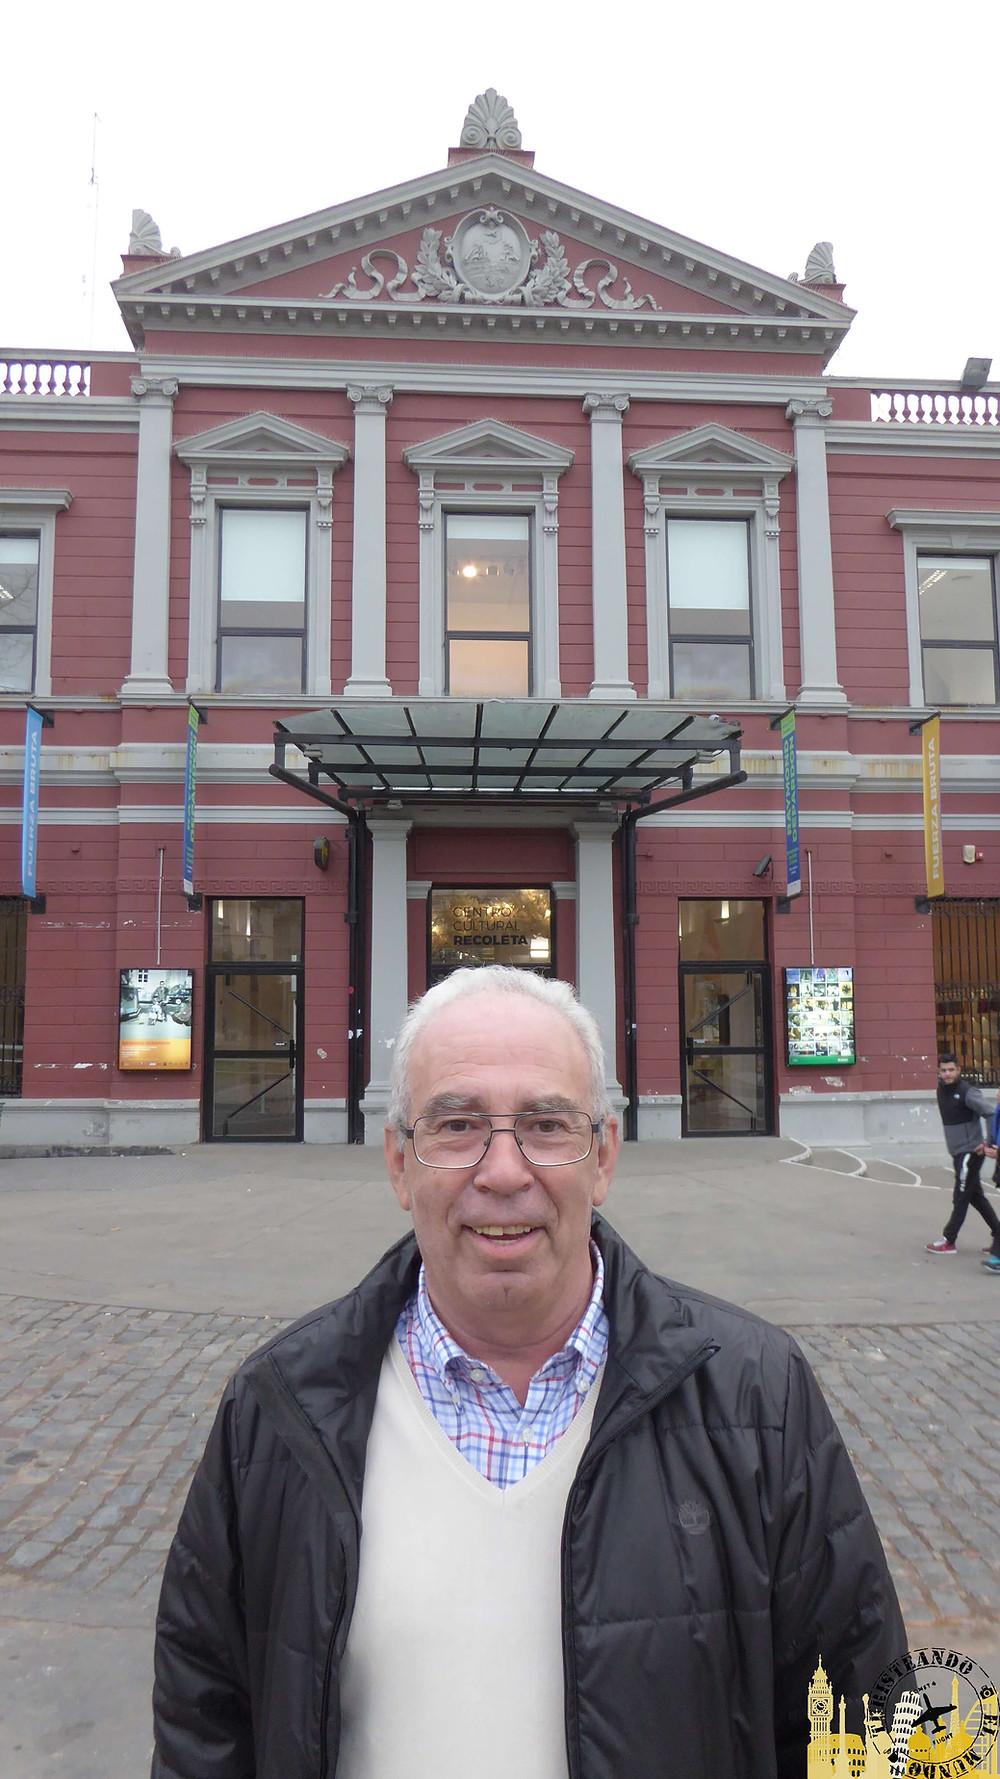 Centro Cultural de la Recoleta, Buenos Aires (Argentina)